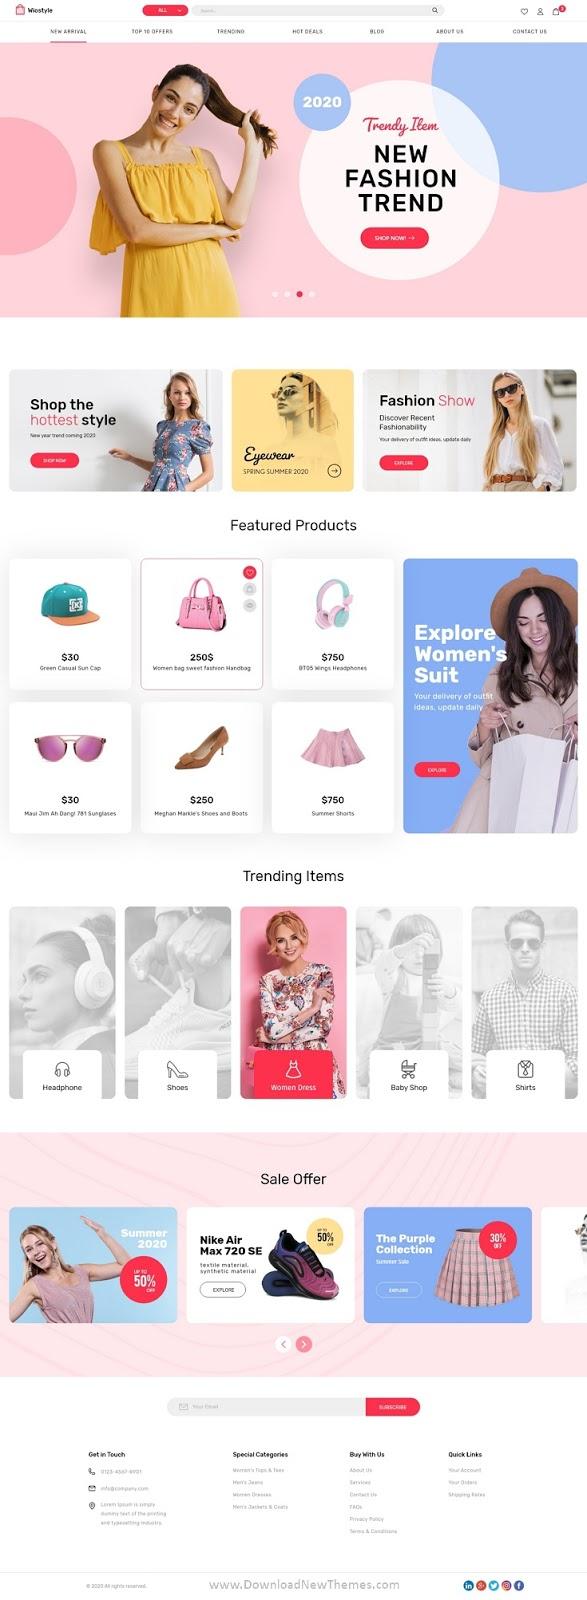 Fashion & Clothing eCommerce Adobe XD Template